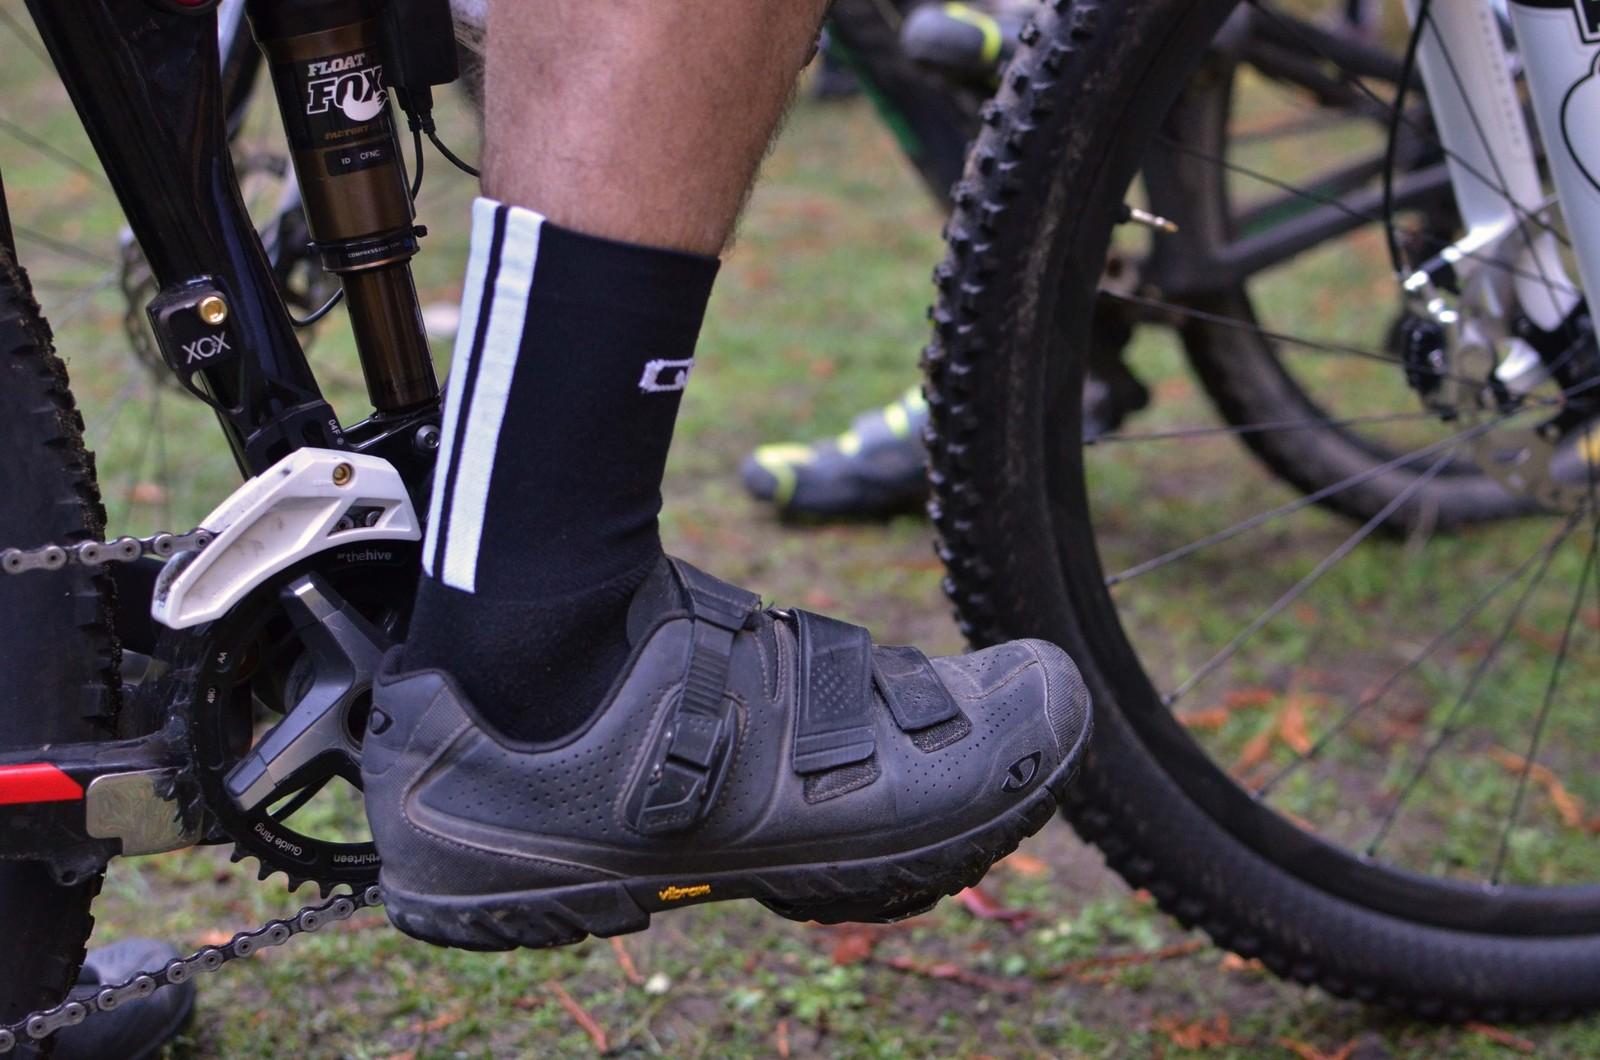 Aaron Bradford's Giro Terraduro Shoes - PIT BITS - 2013 Santa Cruz Super Enduro - Mountain Biking Pictures - Vital MTB